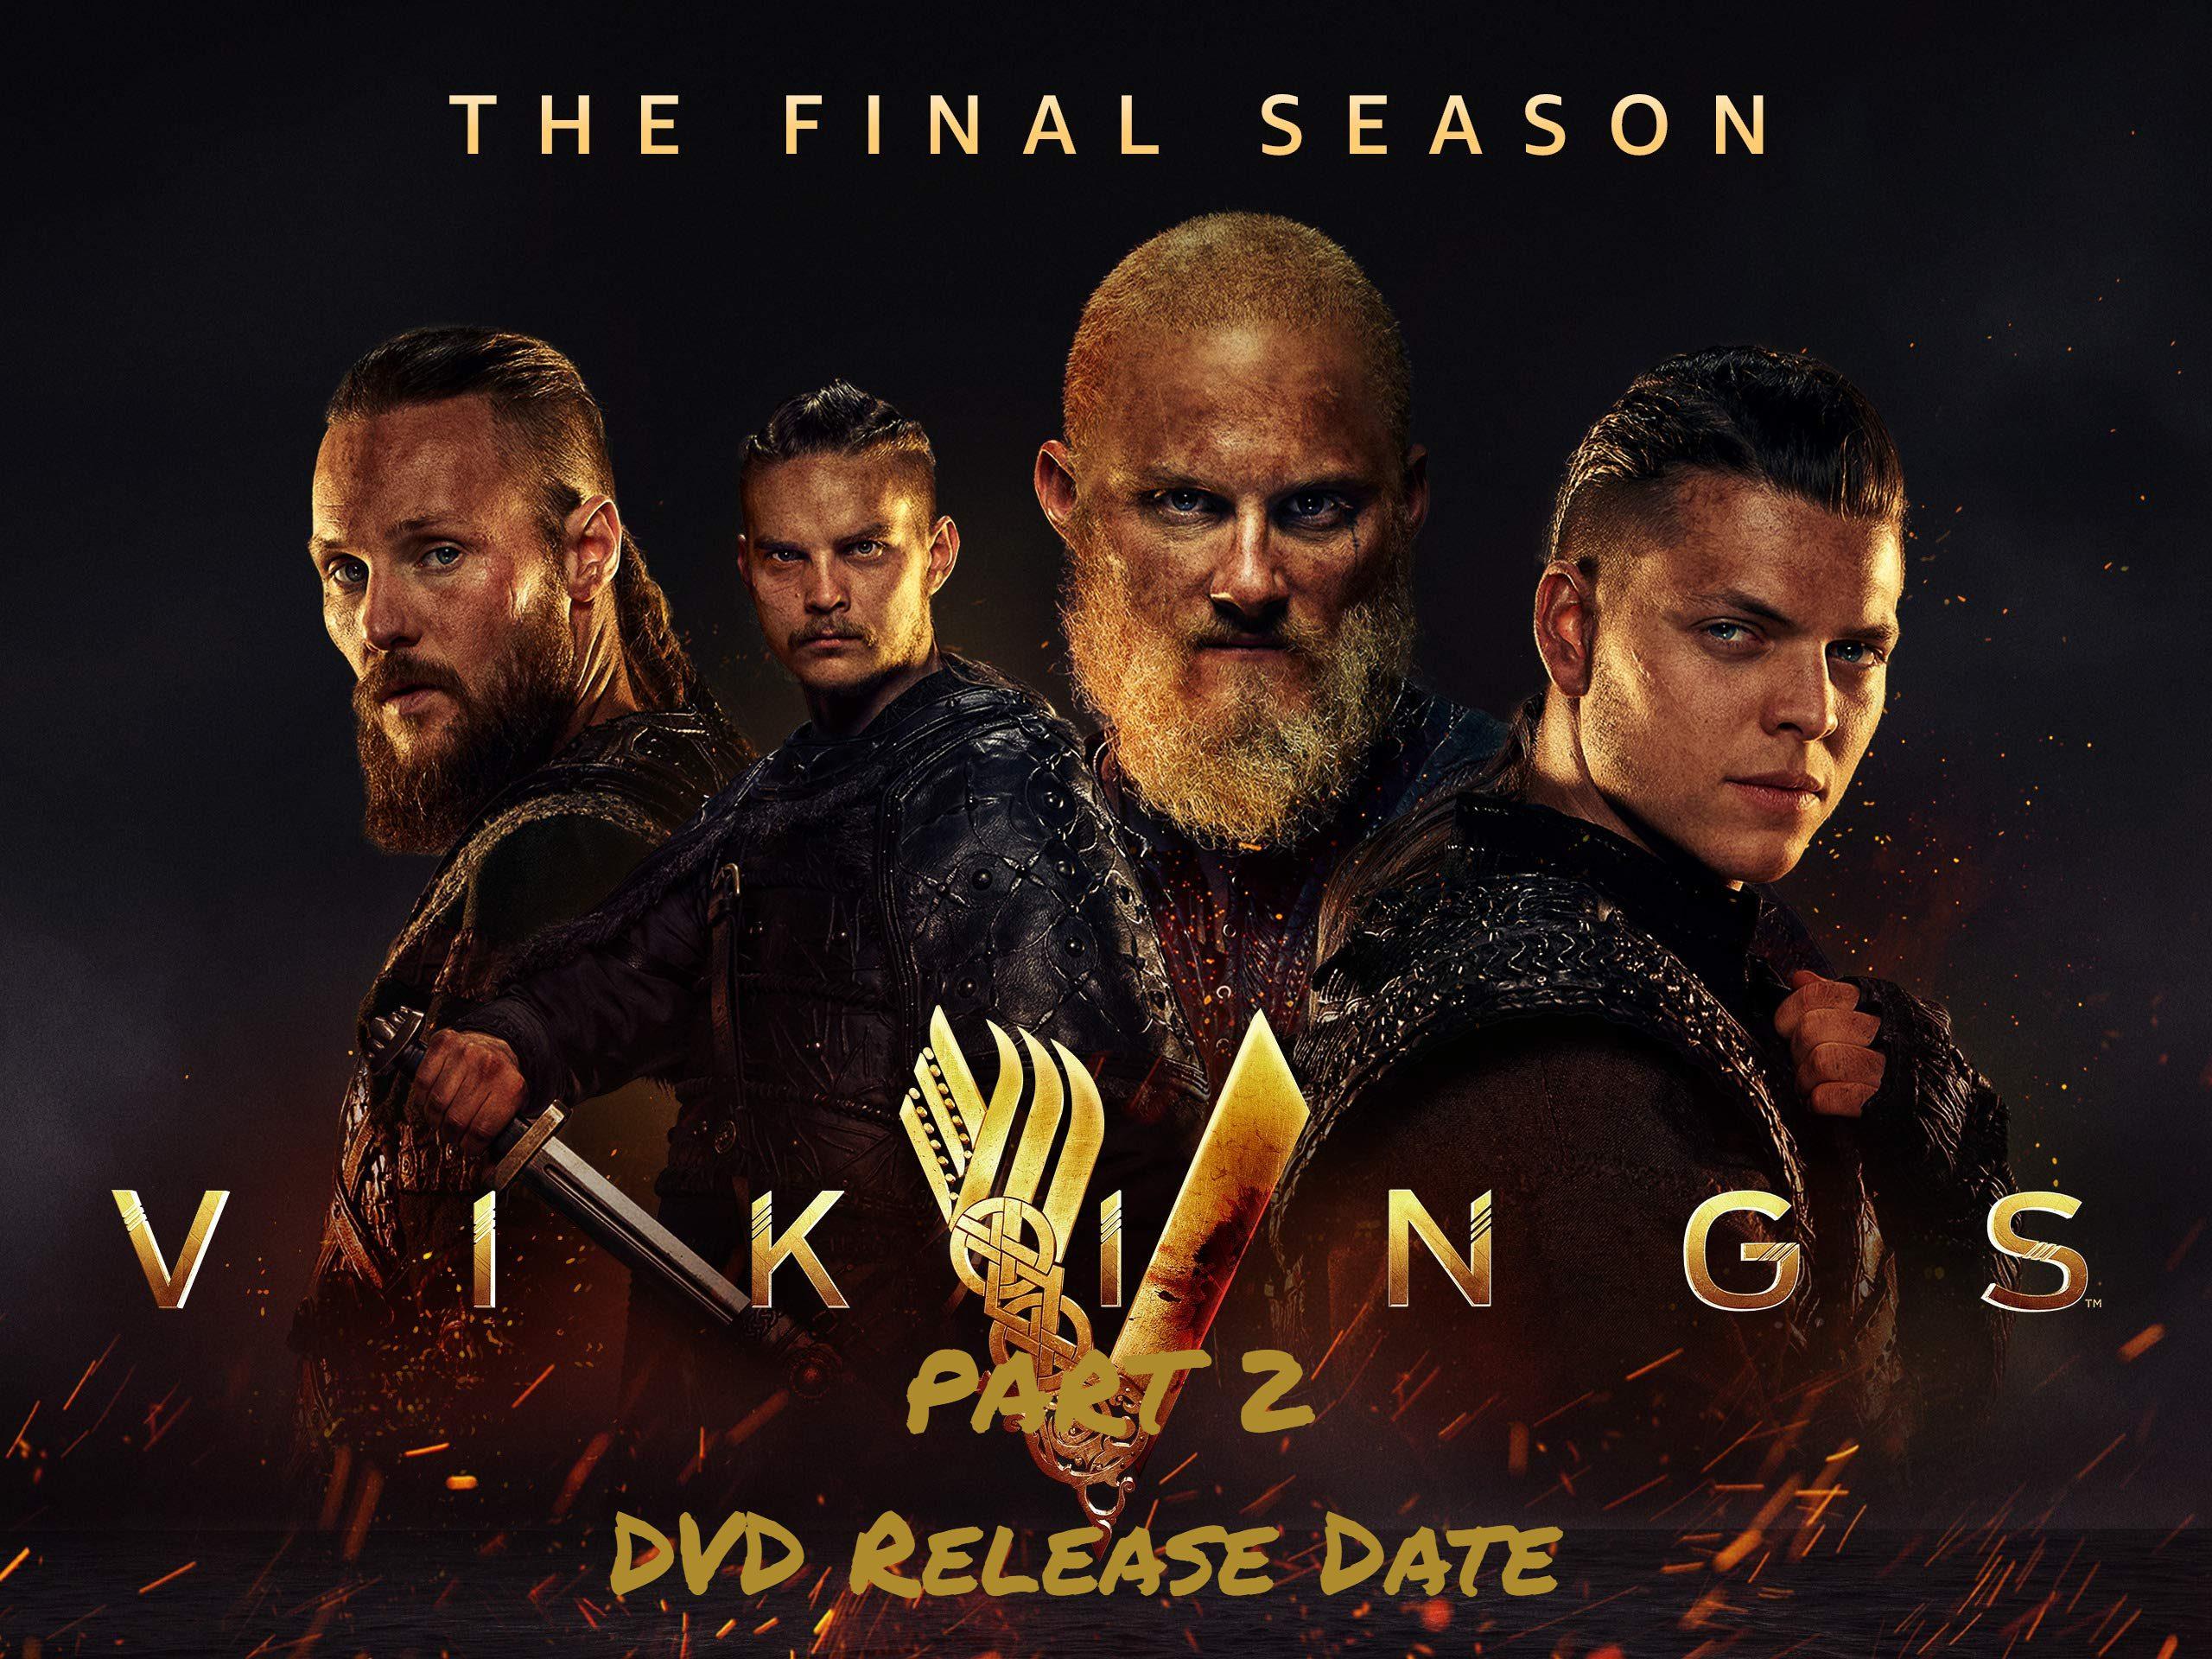 Vikings Season 6 Part 2 DVD Release